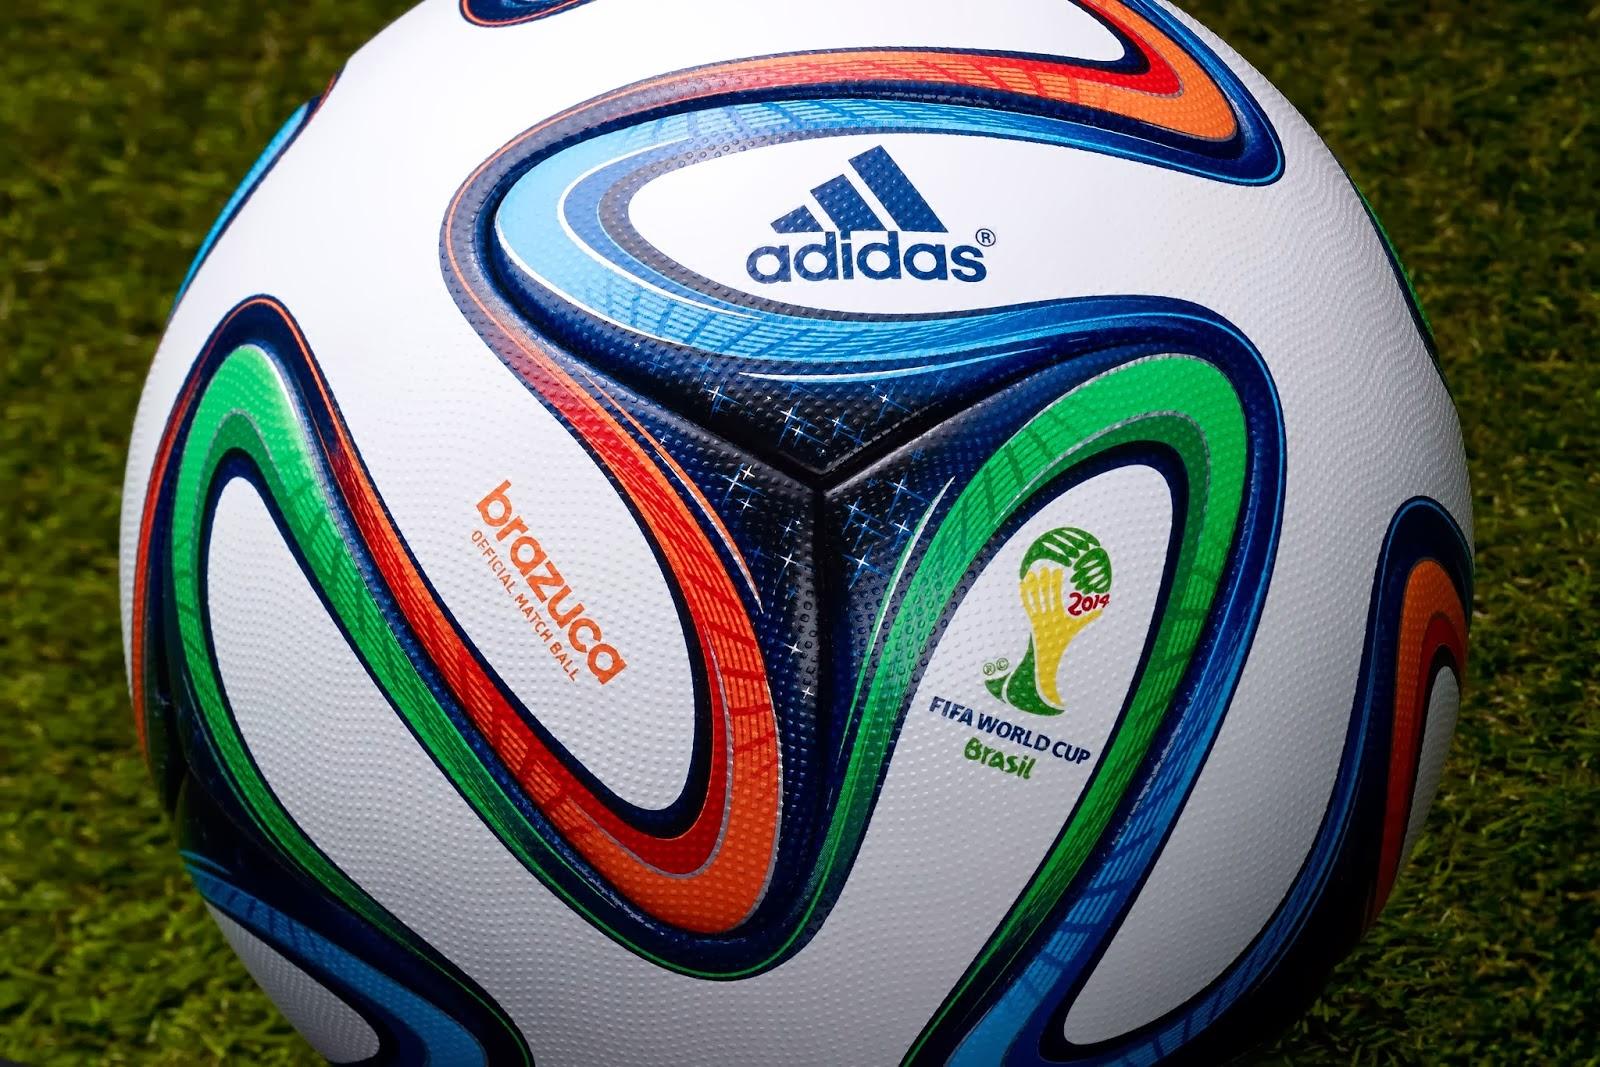 Adidas Wm Ball